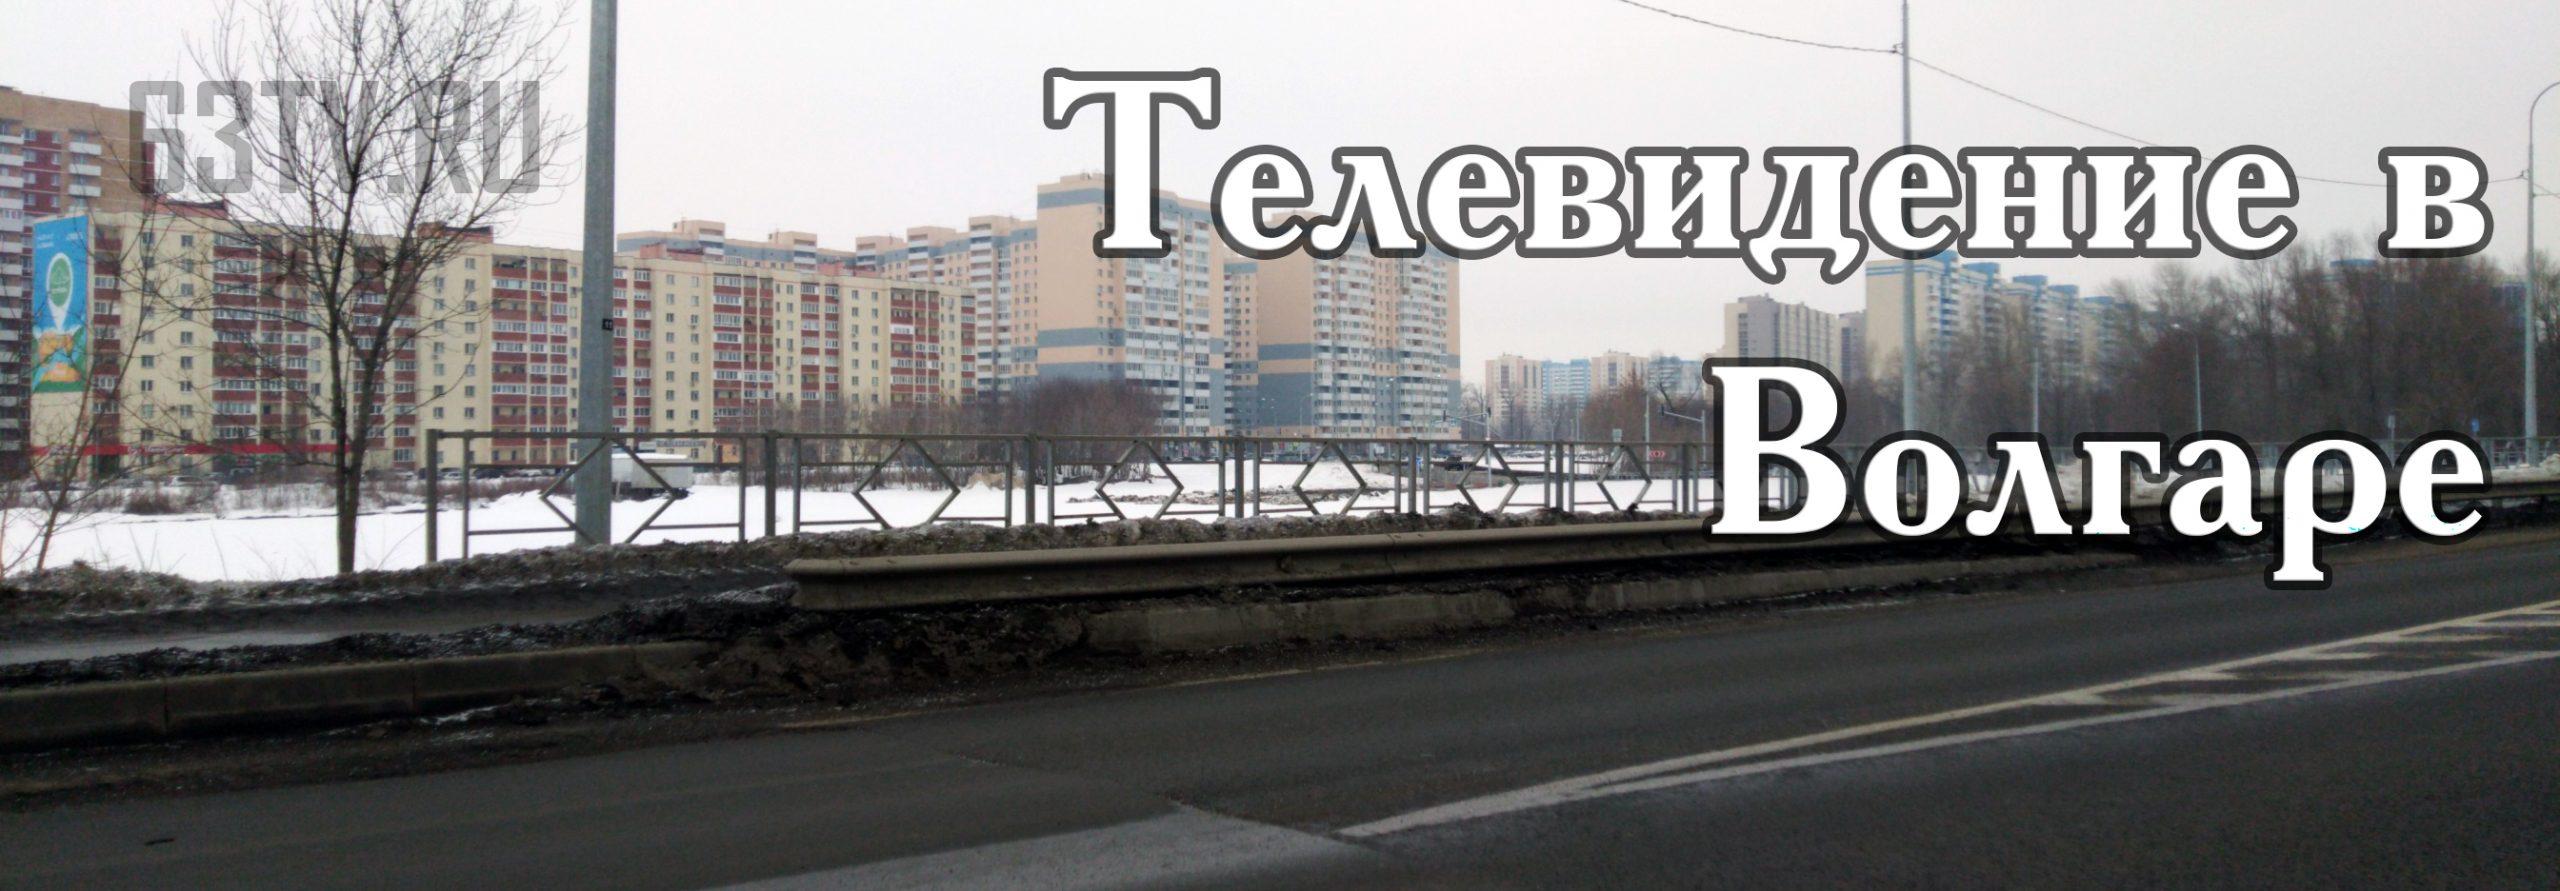 Телевидение в Волгаре